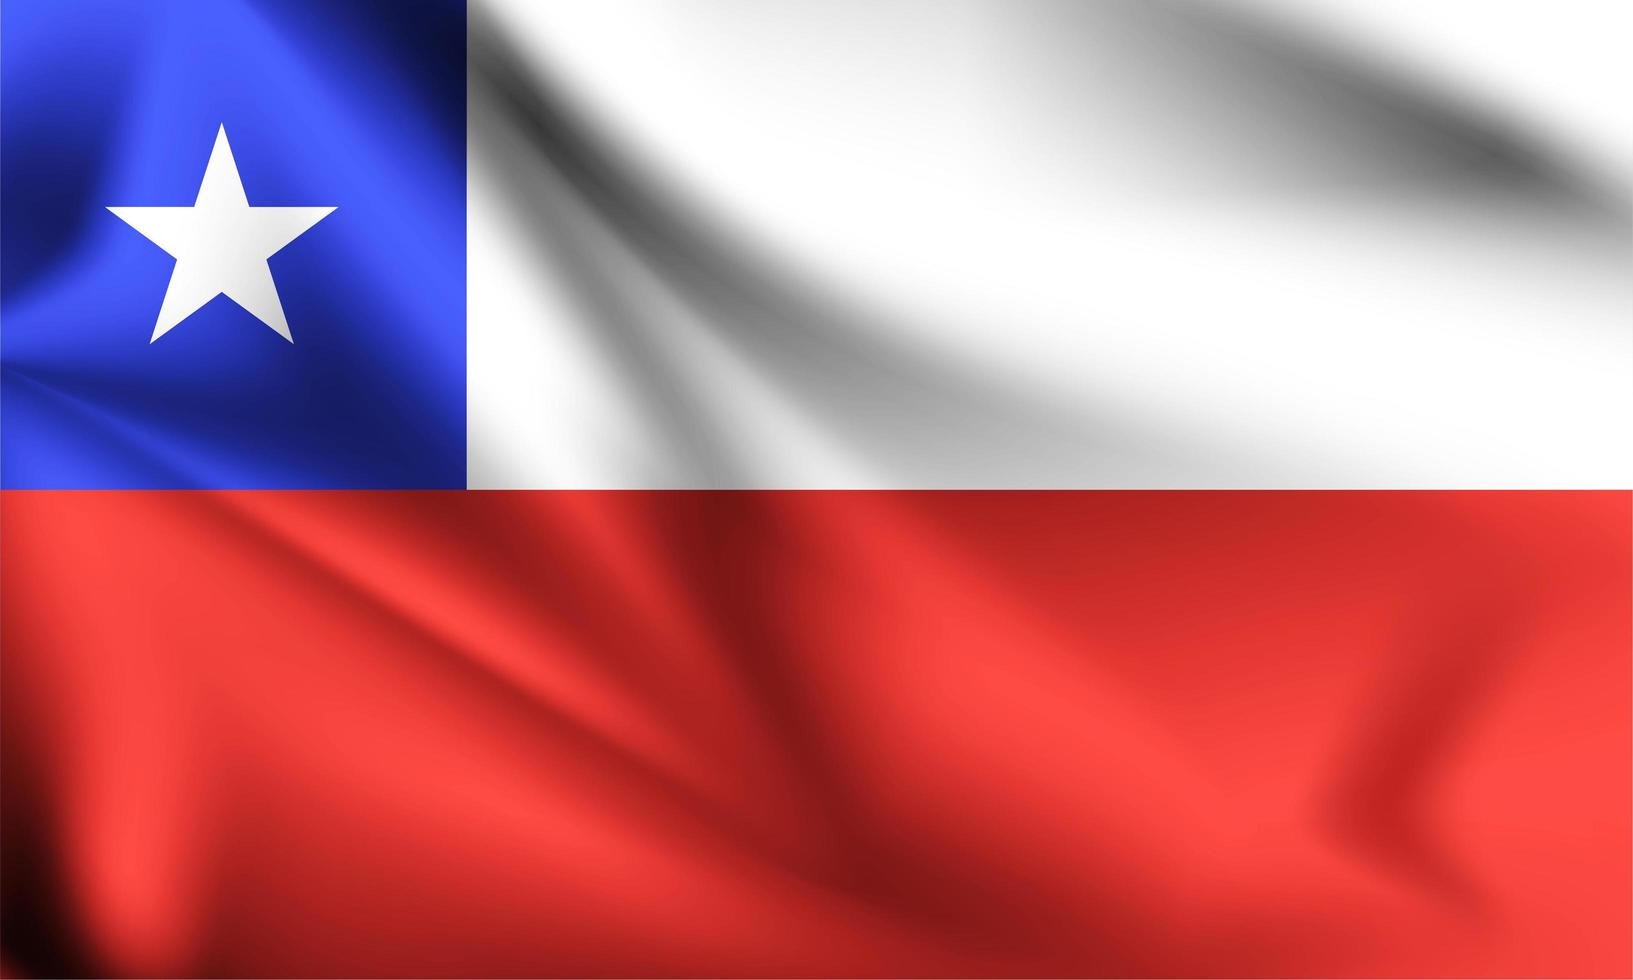 On jugar padel a Xile?